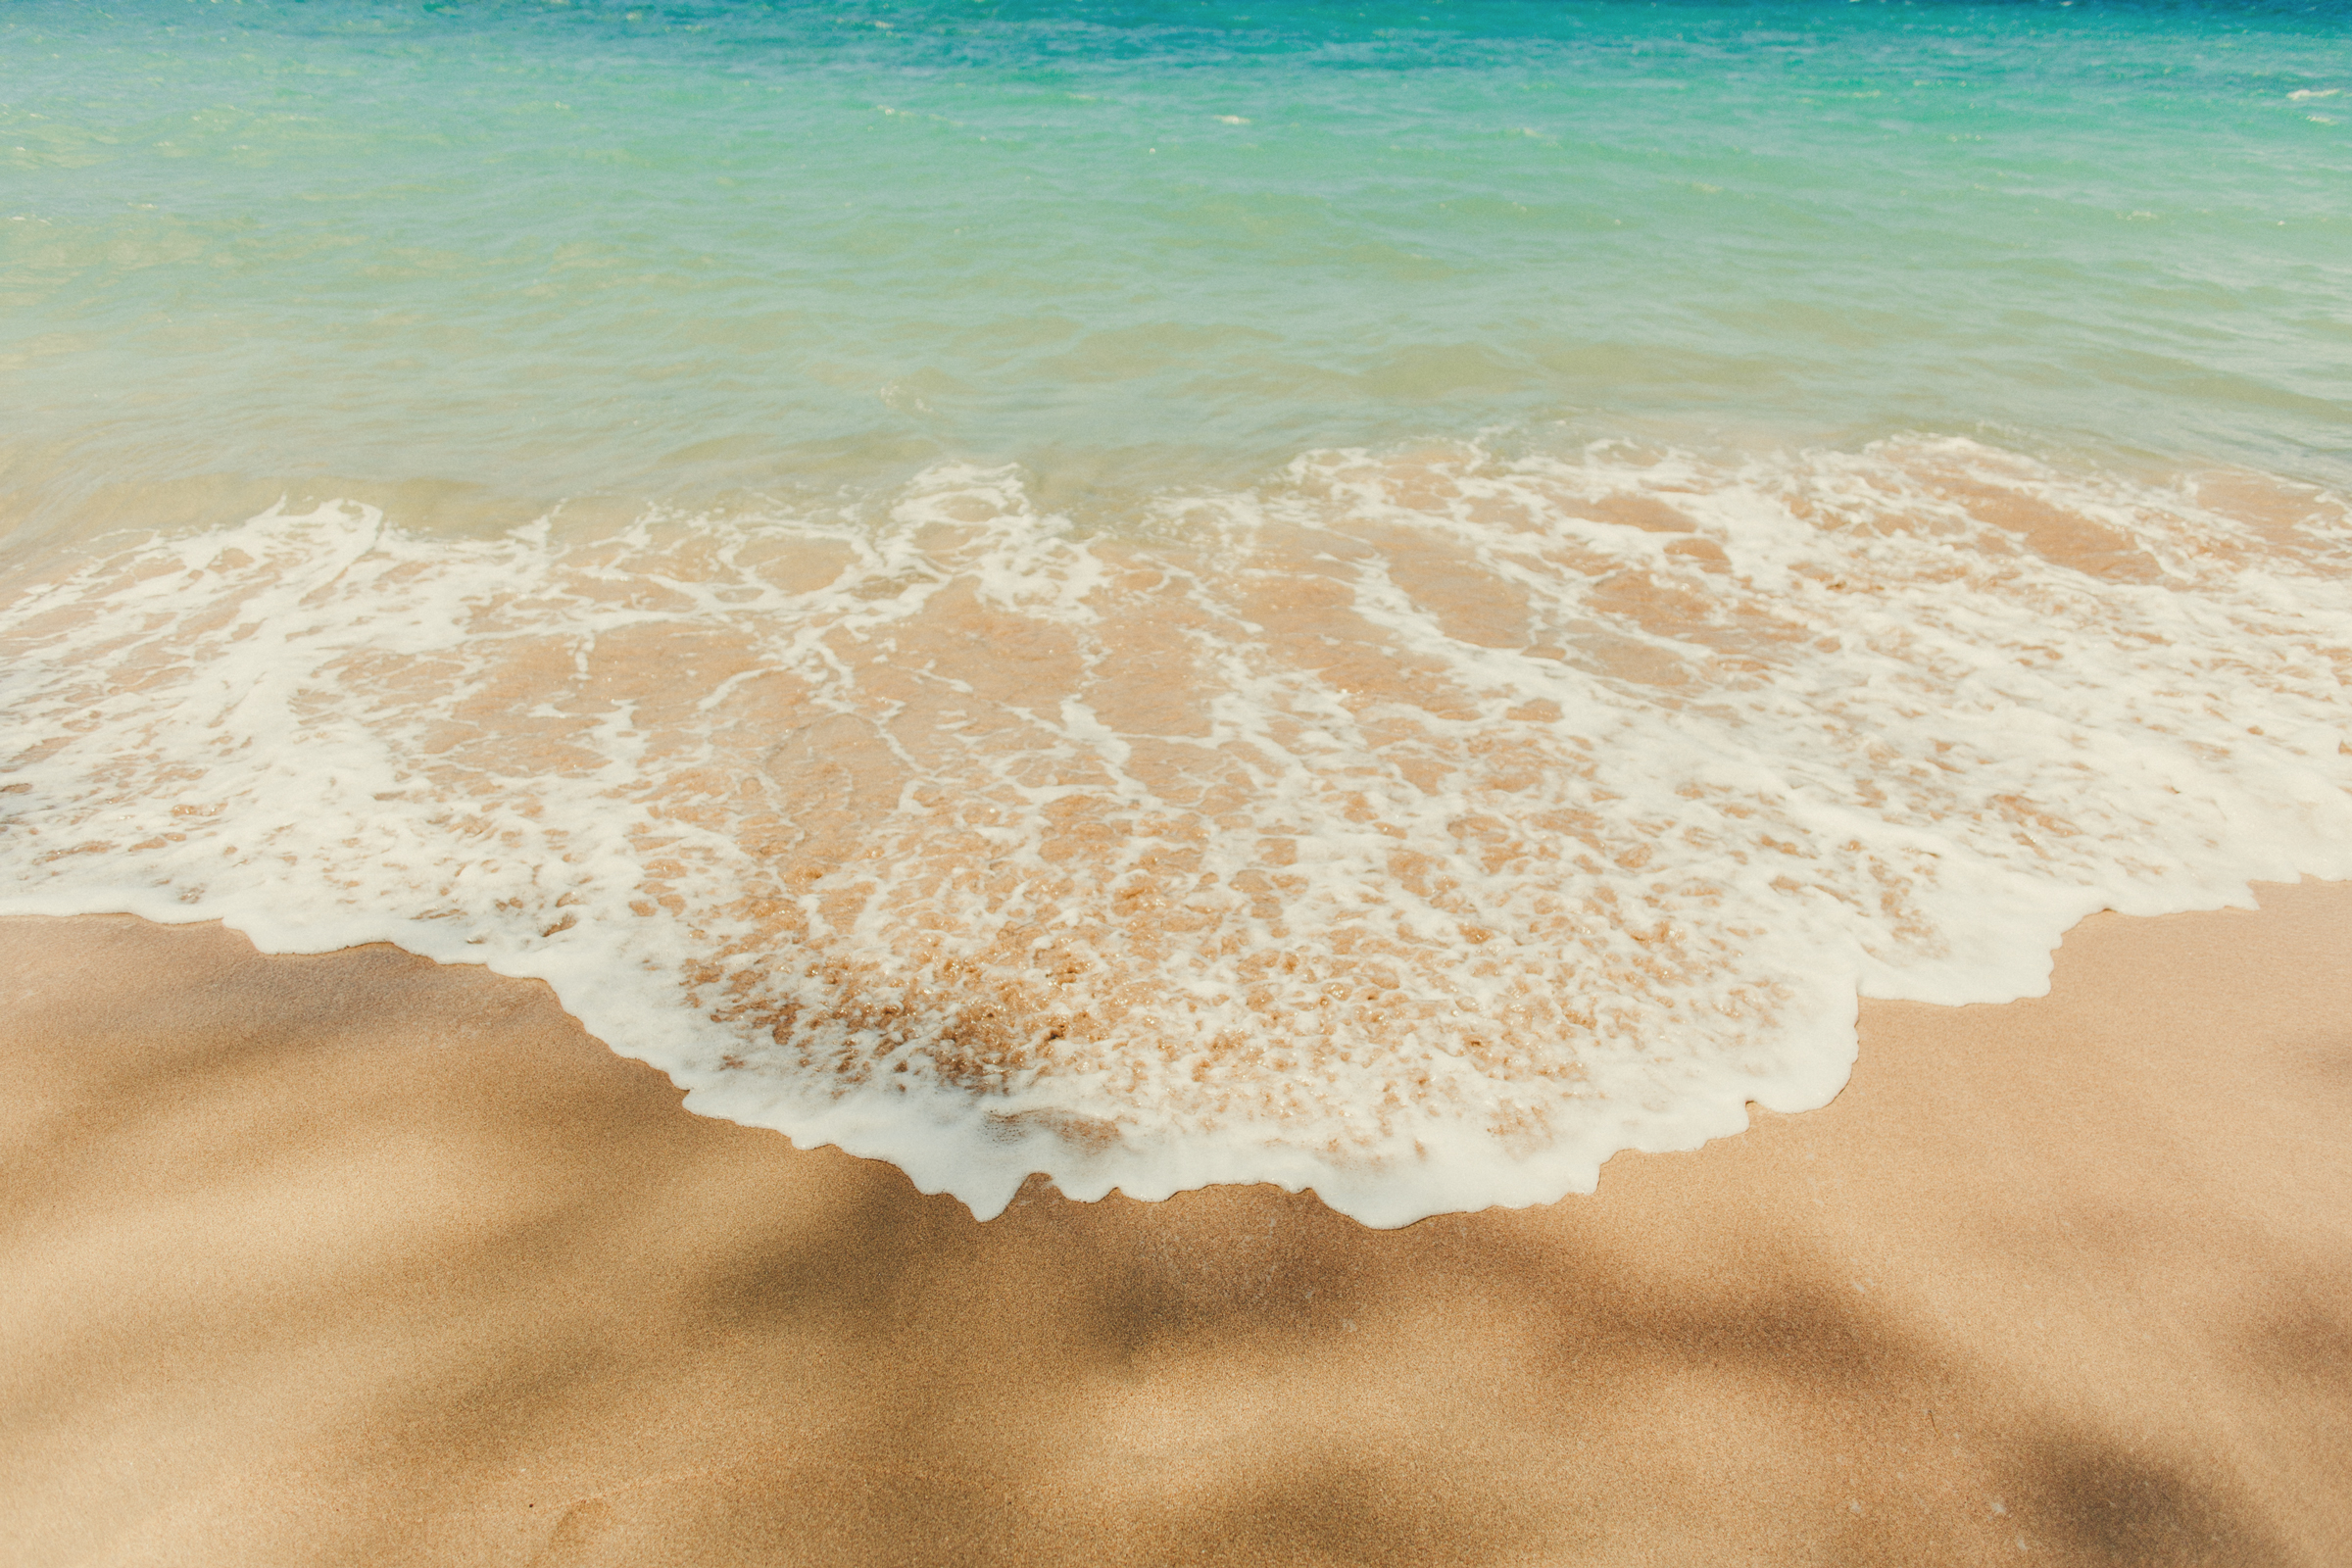 IMG_2240-WEB-KAUAI-HAWAII-JENNIFER-PICARD-PHOTOGRAPHY.jpg